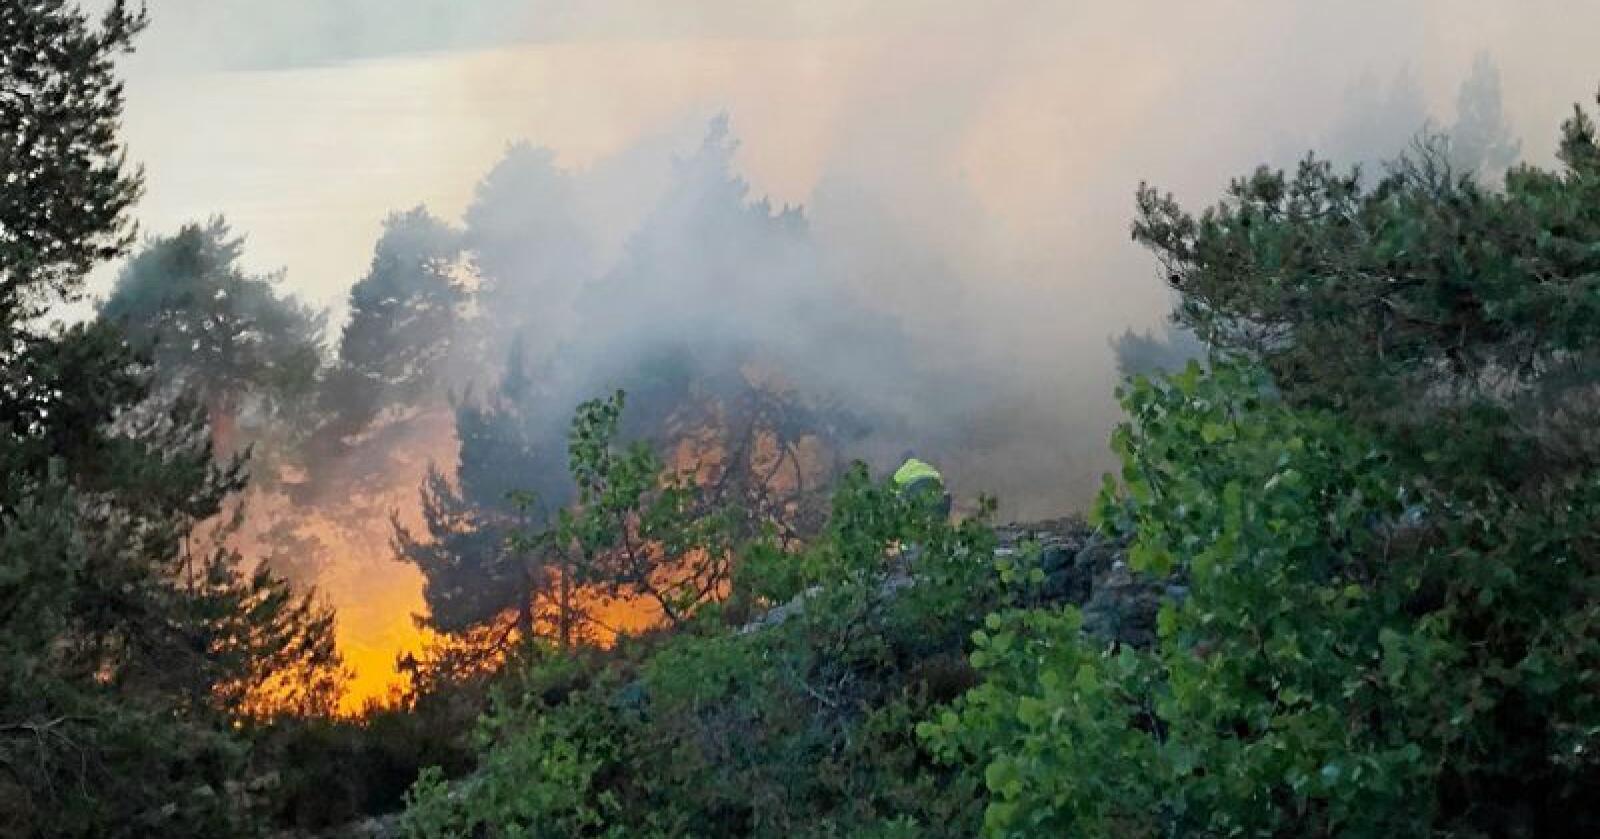 Med varmere klima vil det bli flere skogbranner. Foto: Tor Aage Hansen / NTB scanpix